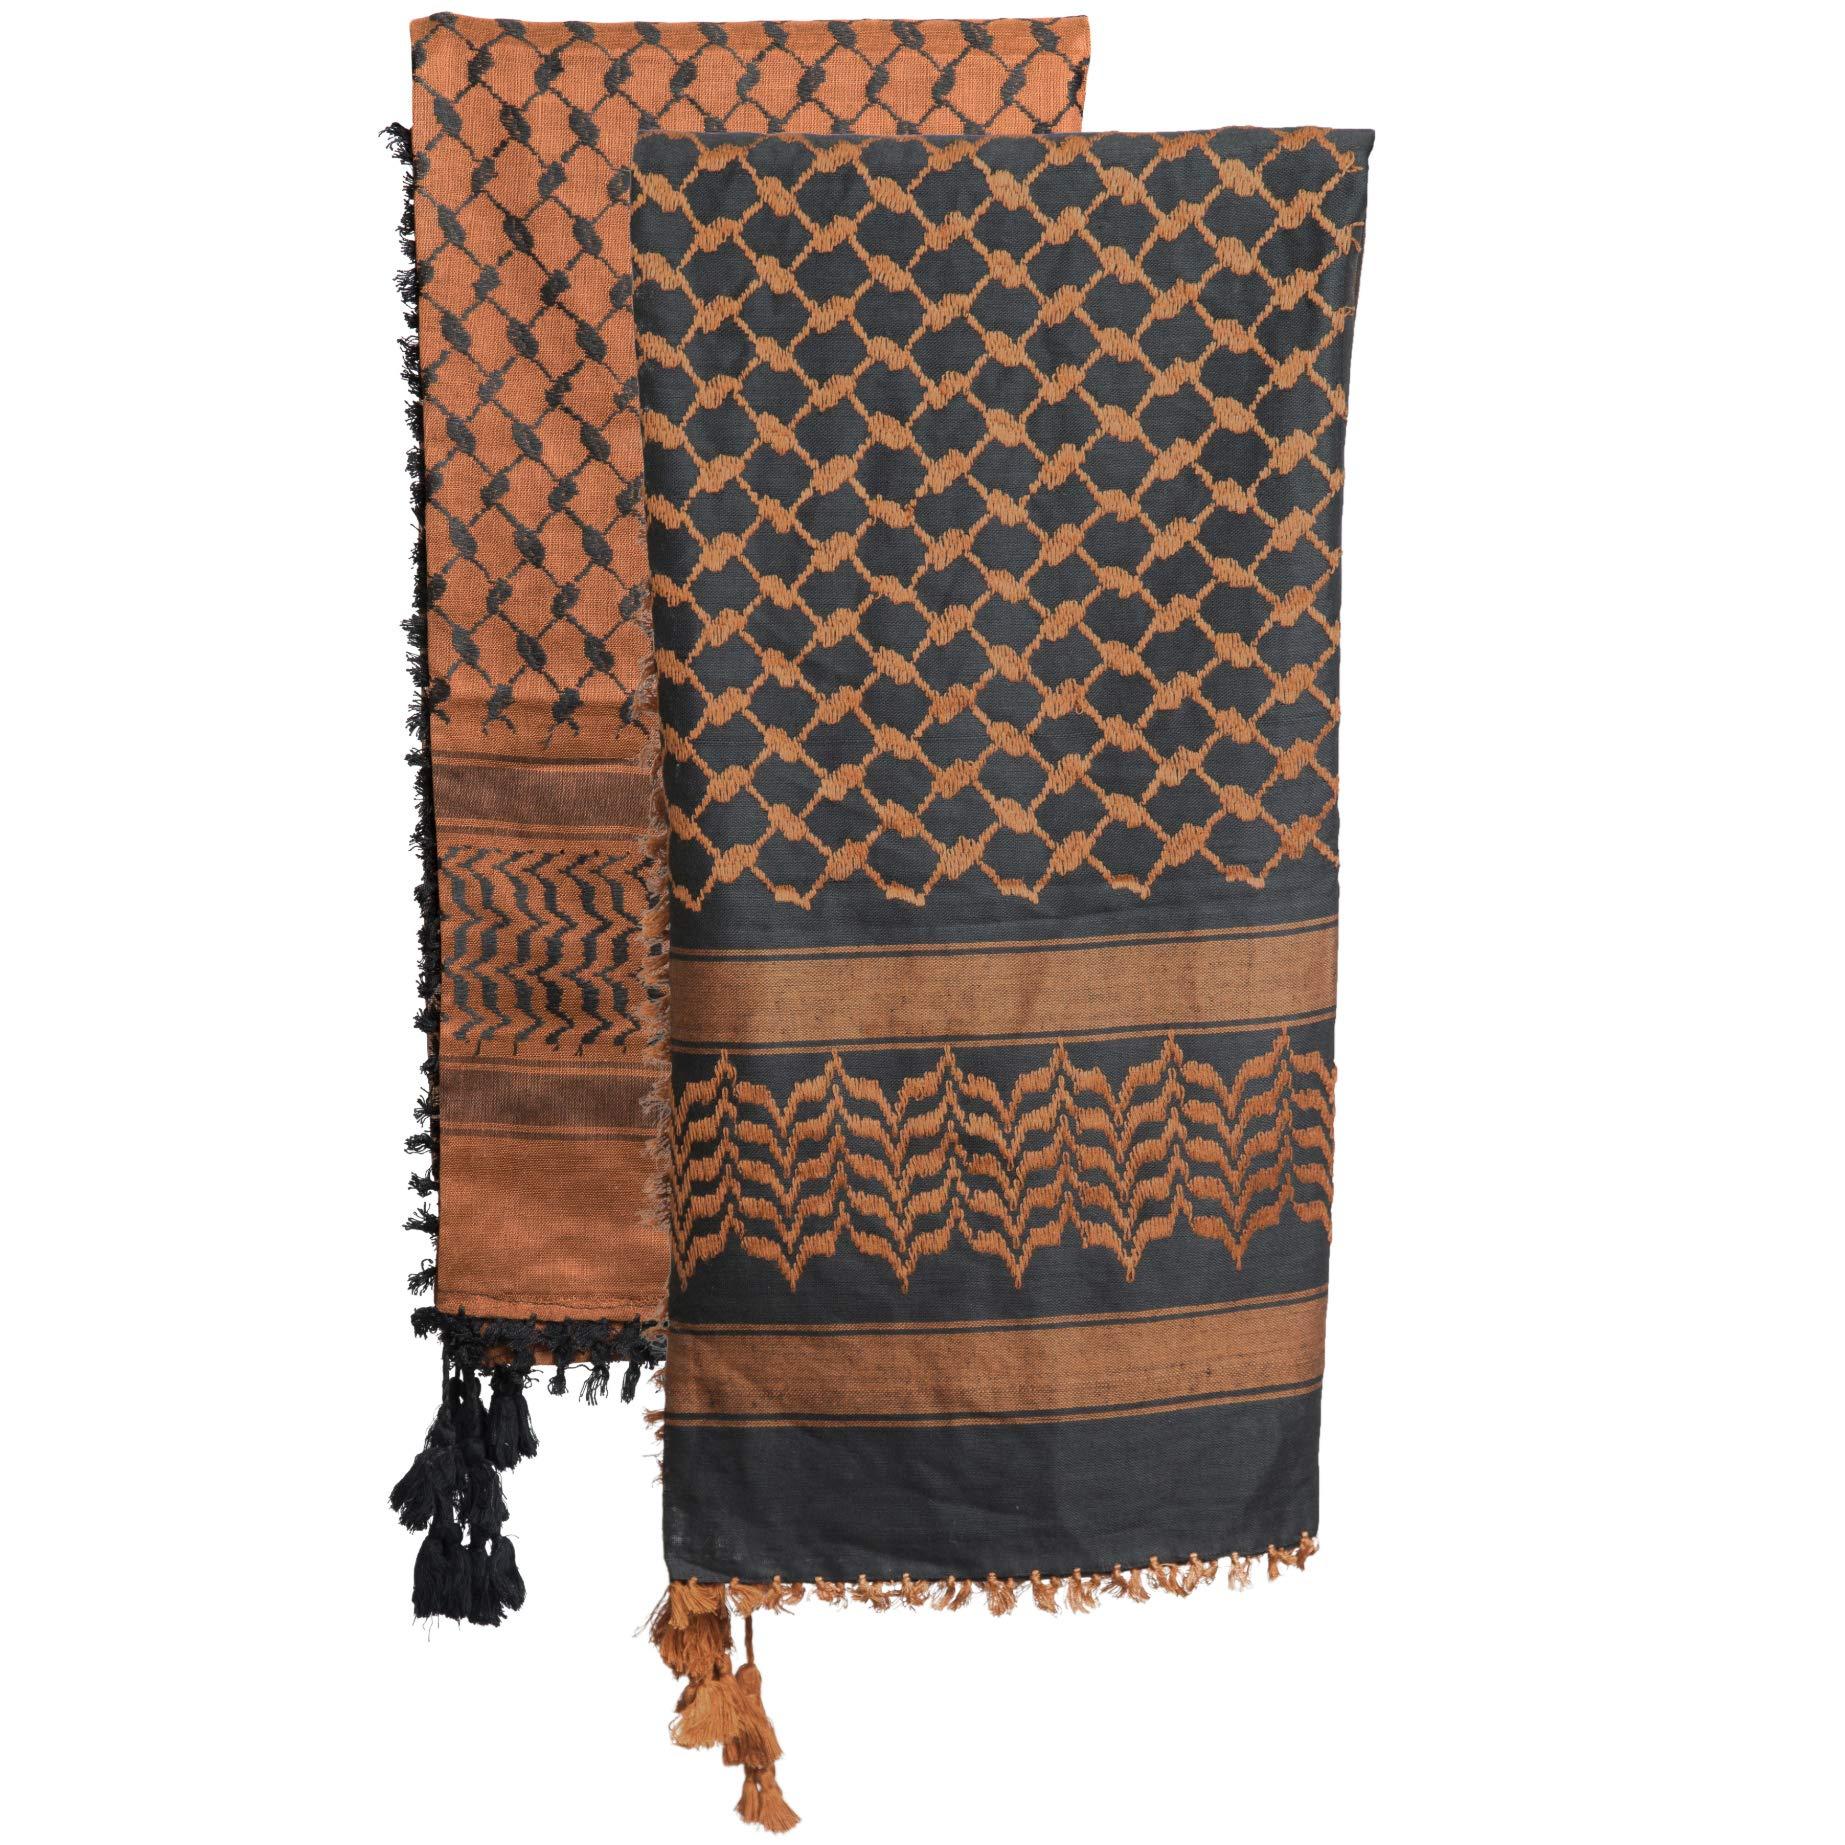 2 Pack Mora Premium Shemagh Scarf Large 100% Cotton Arab Tactical Military Desert Head Neck Keffiyeh Wrap (Brown Black)